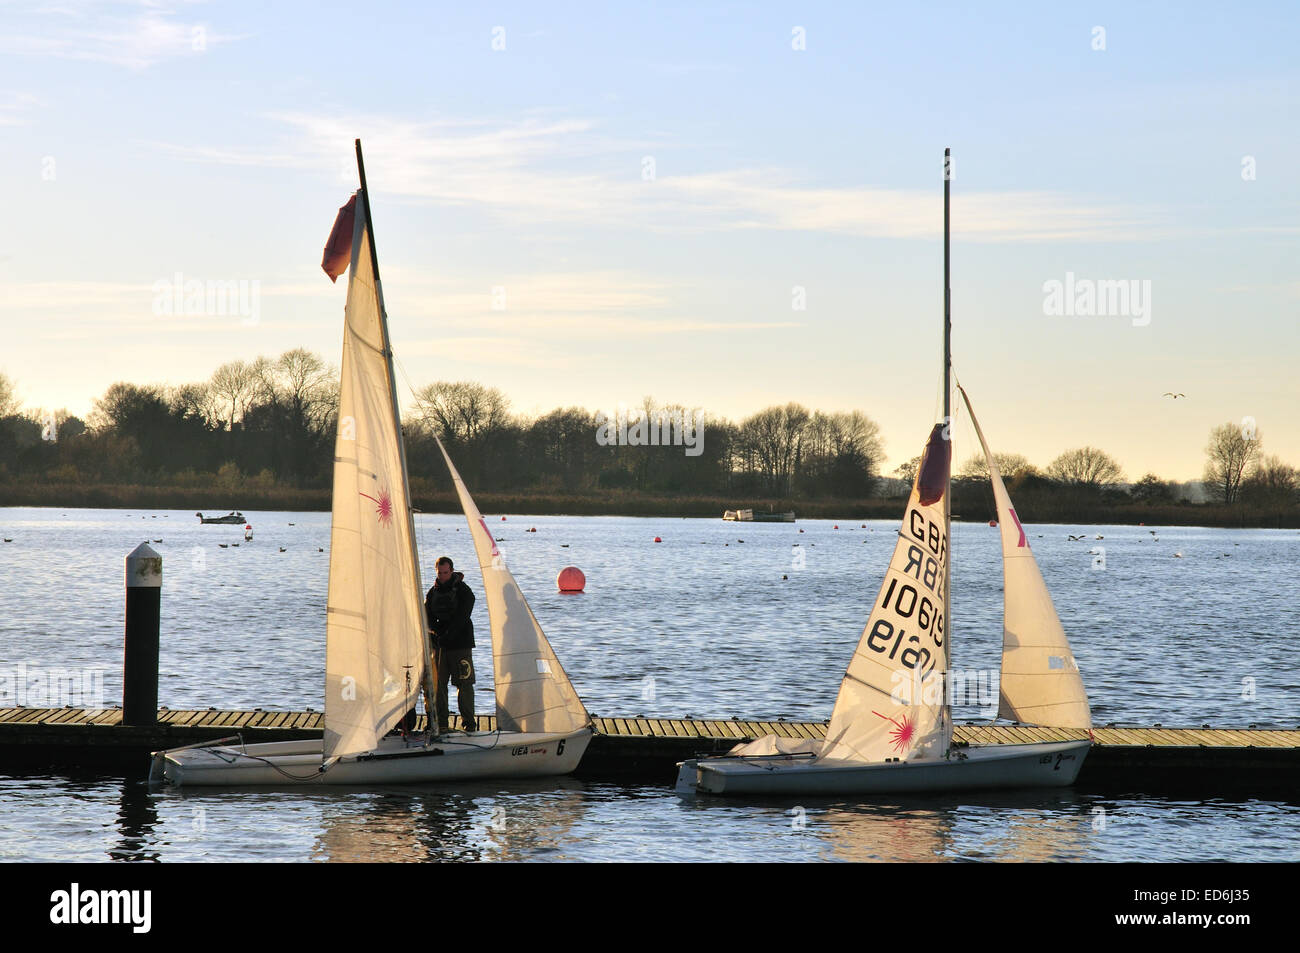 Man getting sail boats ready to sail - Stock Image